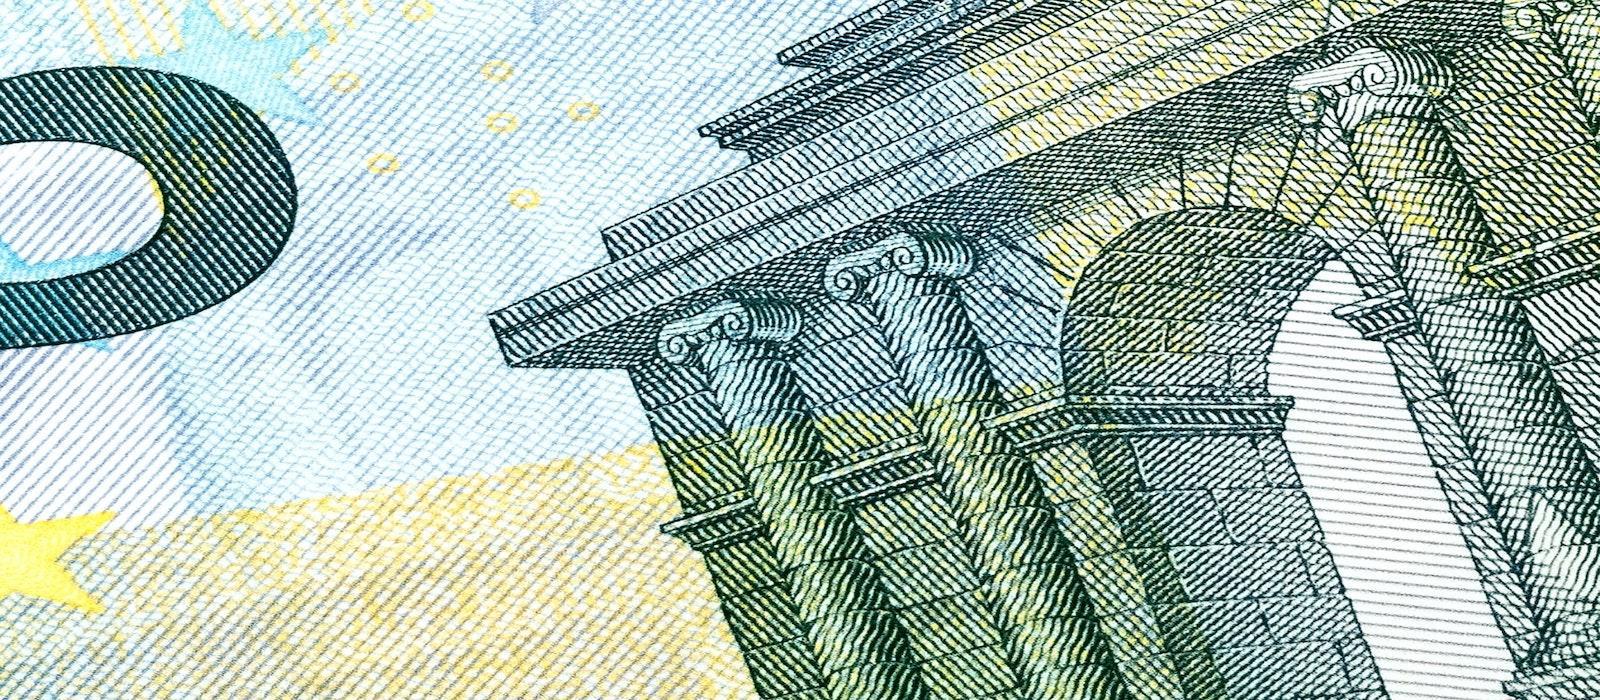 Top 10 Financial Mistakes Thumbnail